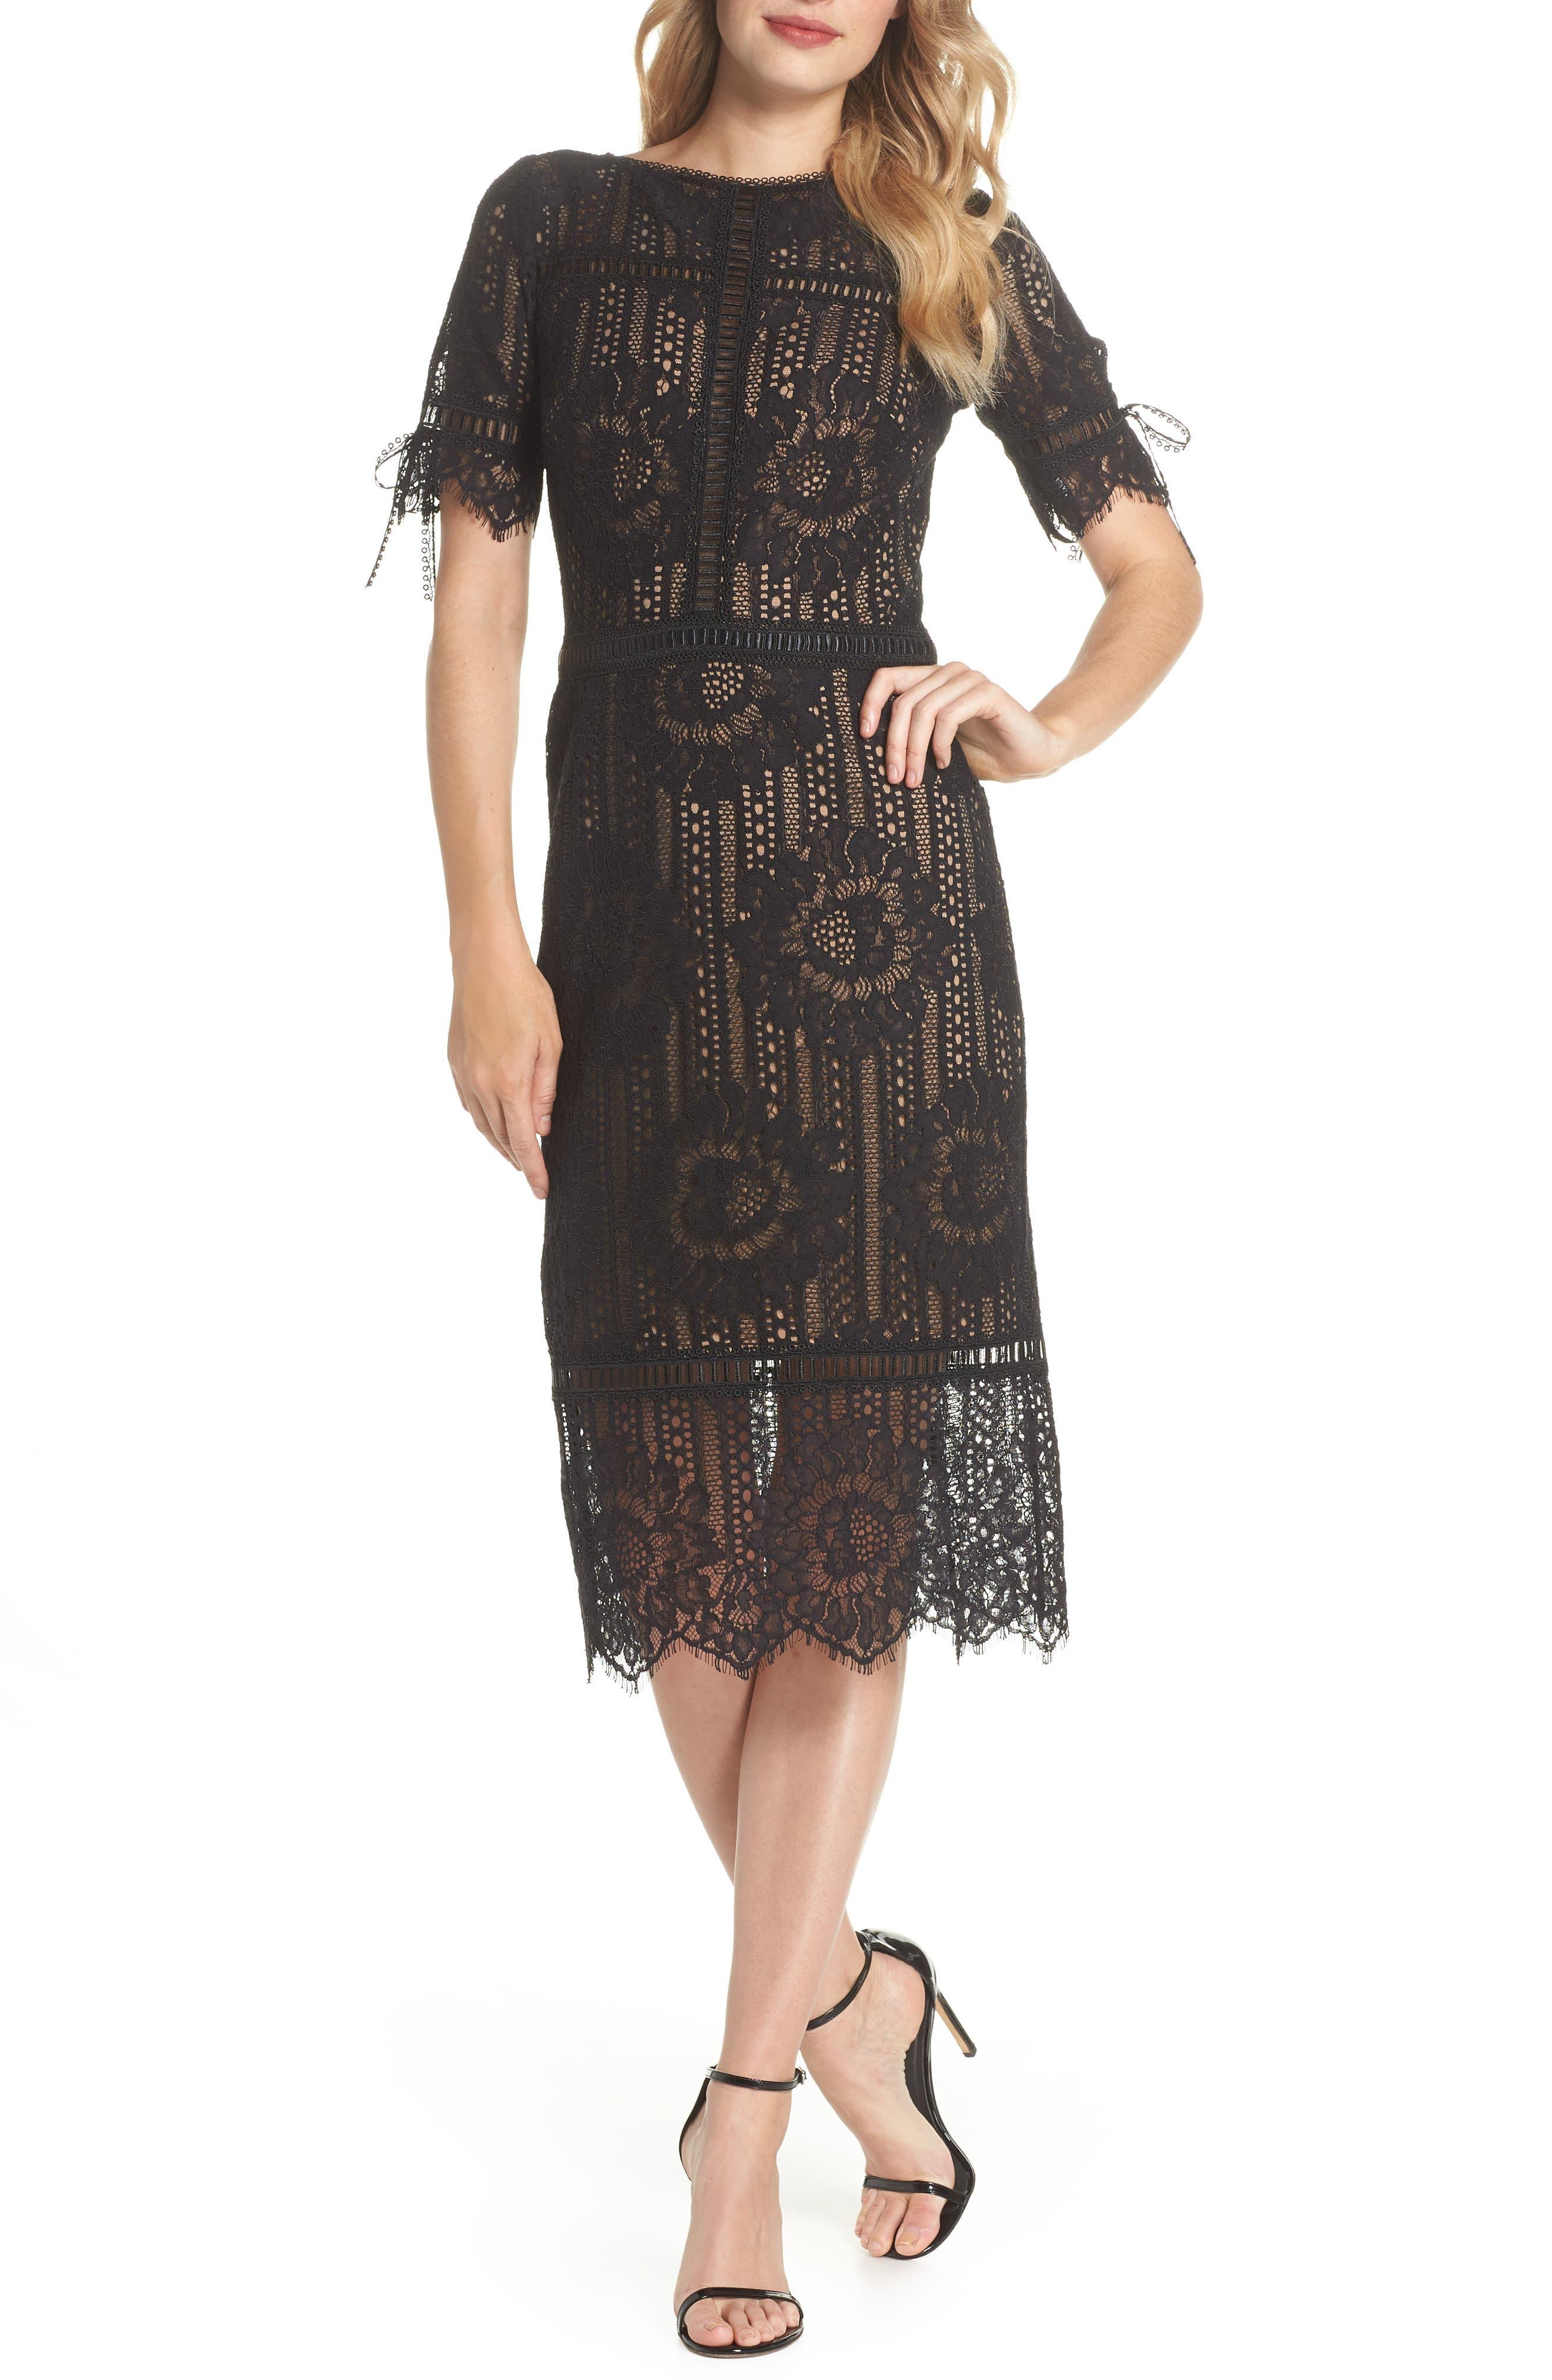 Alternate Image 1 Selected - Tadashi Shoji Tie Sleeve Lace Dress